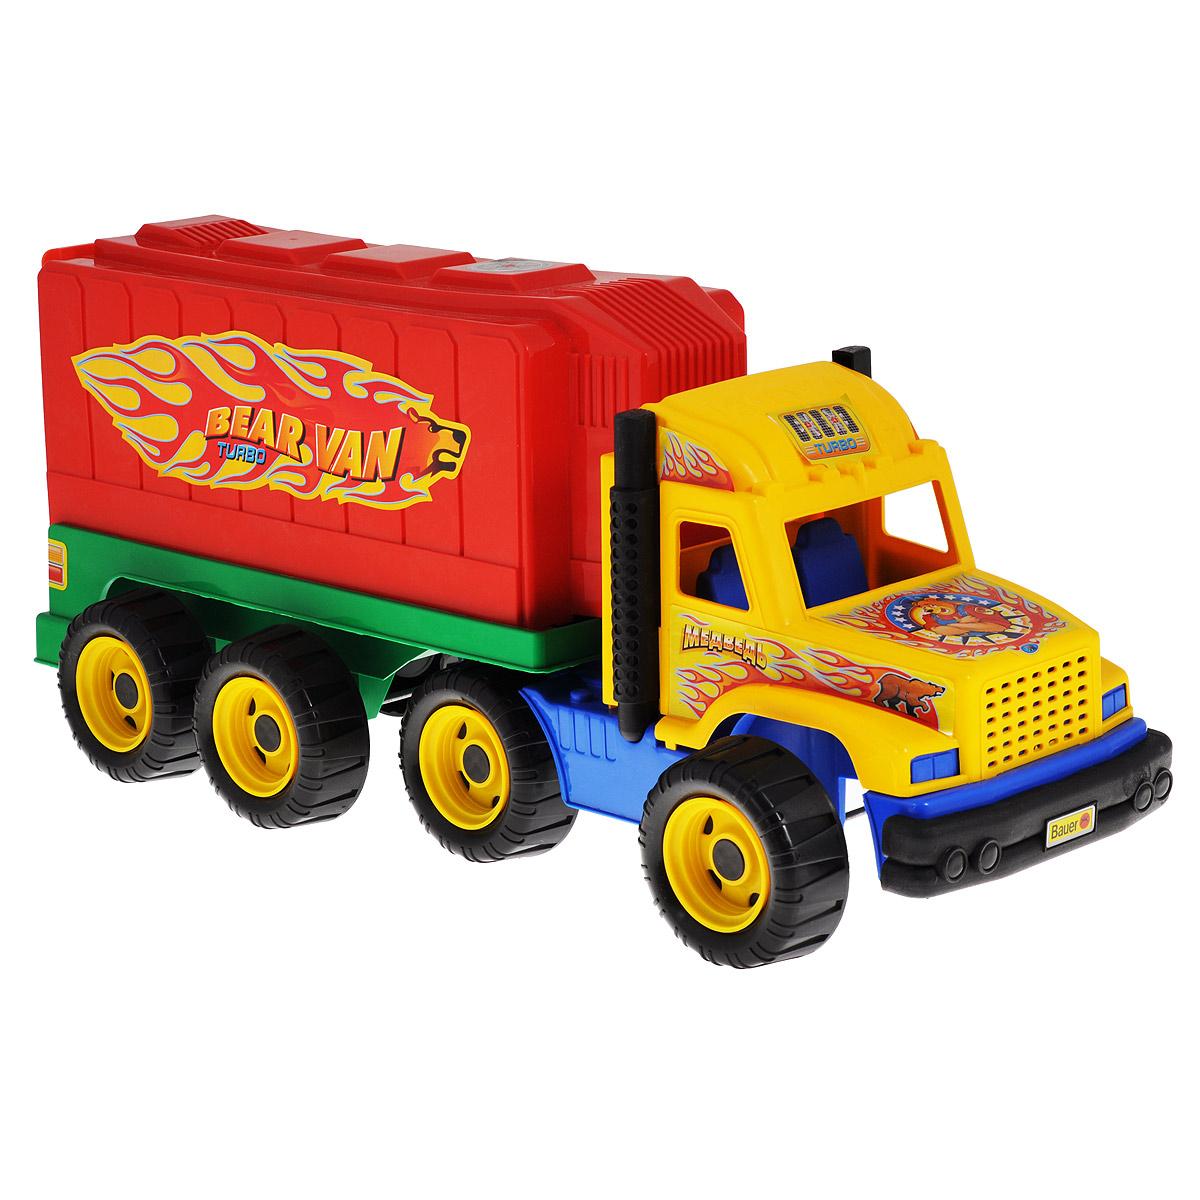 Bauer toys Bauer Грузовик Медведь цвет кабины желтый 166